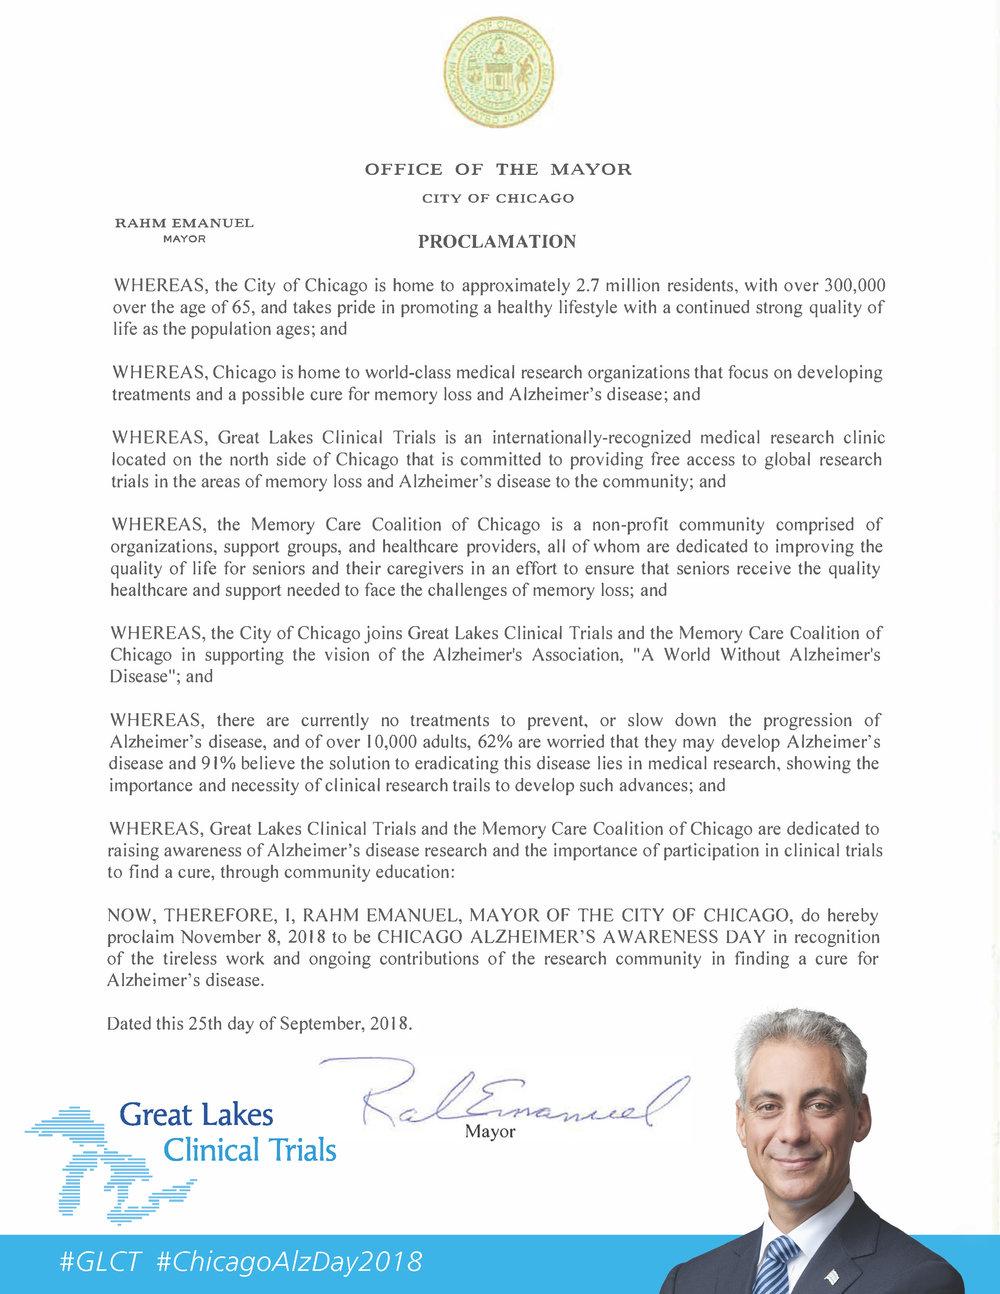 GLCT AlzDay18 Proclamation.jpg